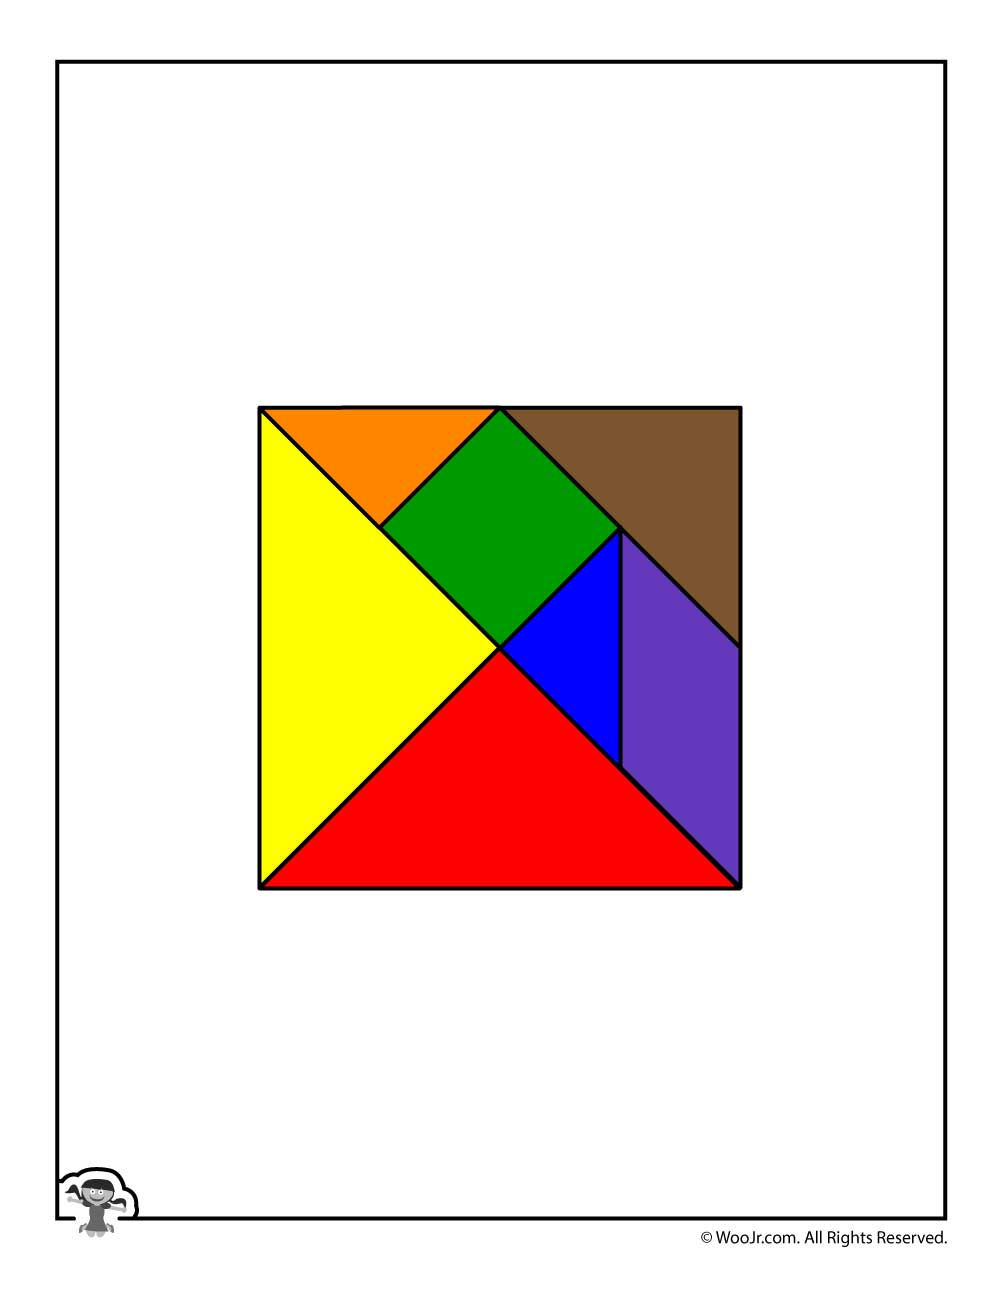 Printable Tangram Puzzle Pieces | Woo! Jr. Kids Activities - Printable Tangram Puzzle Pieces